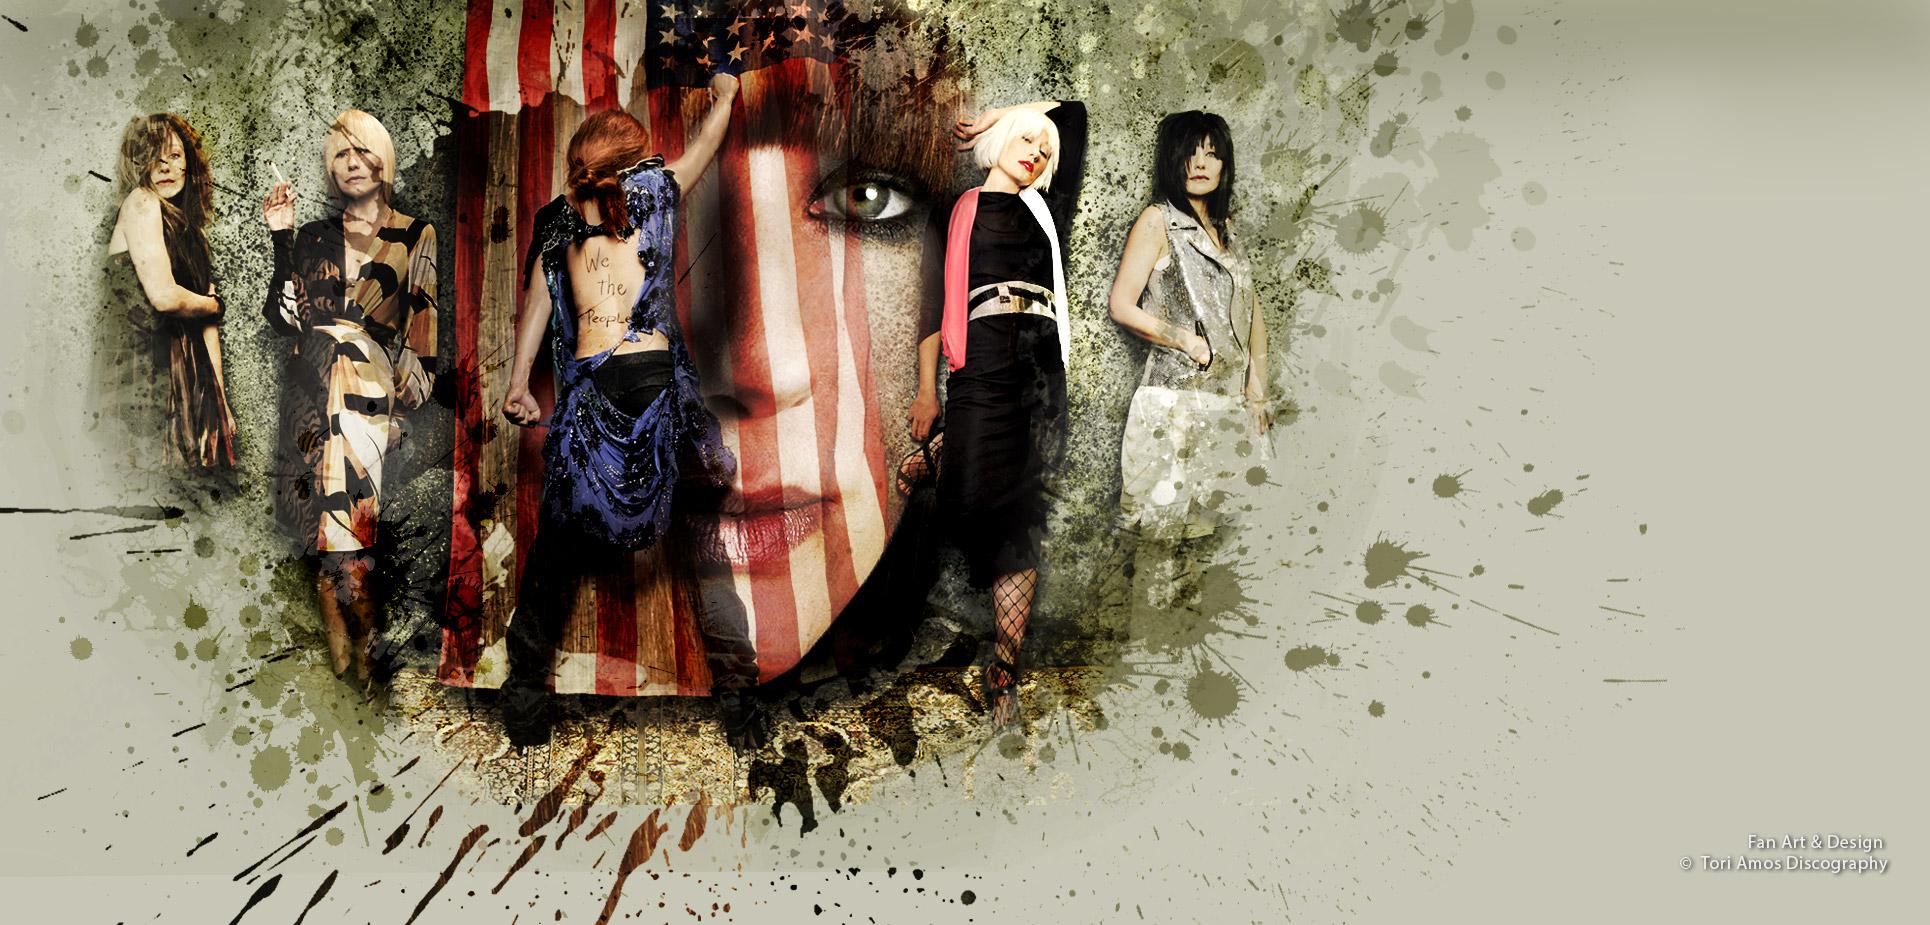 American Doll Posse Album Tori Amos Discography